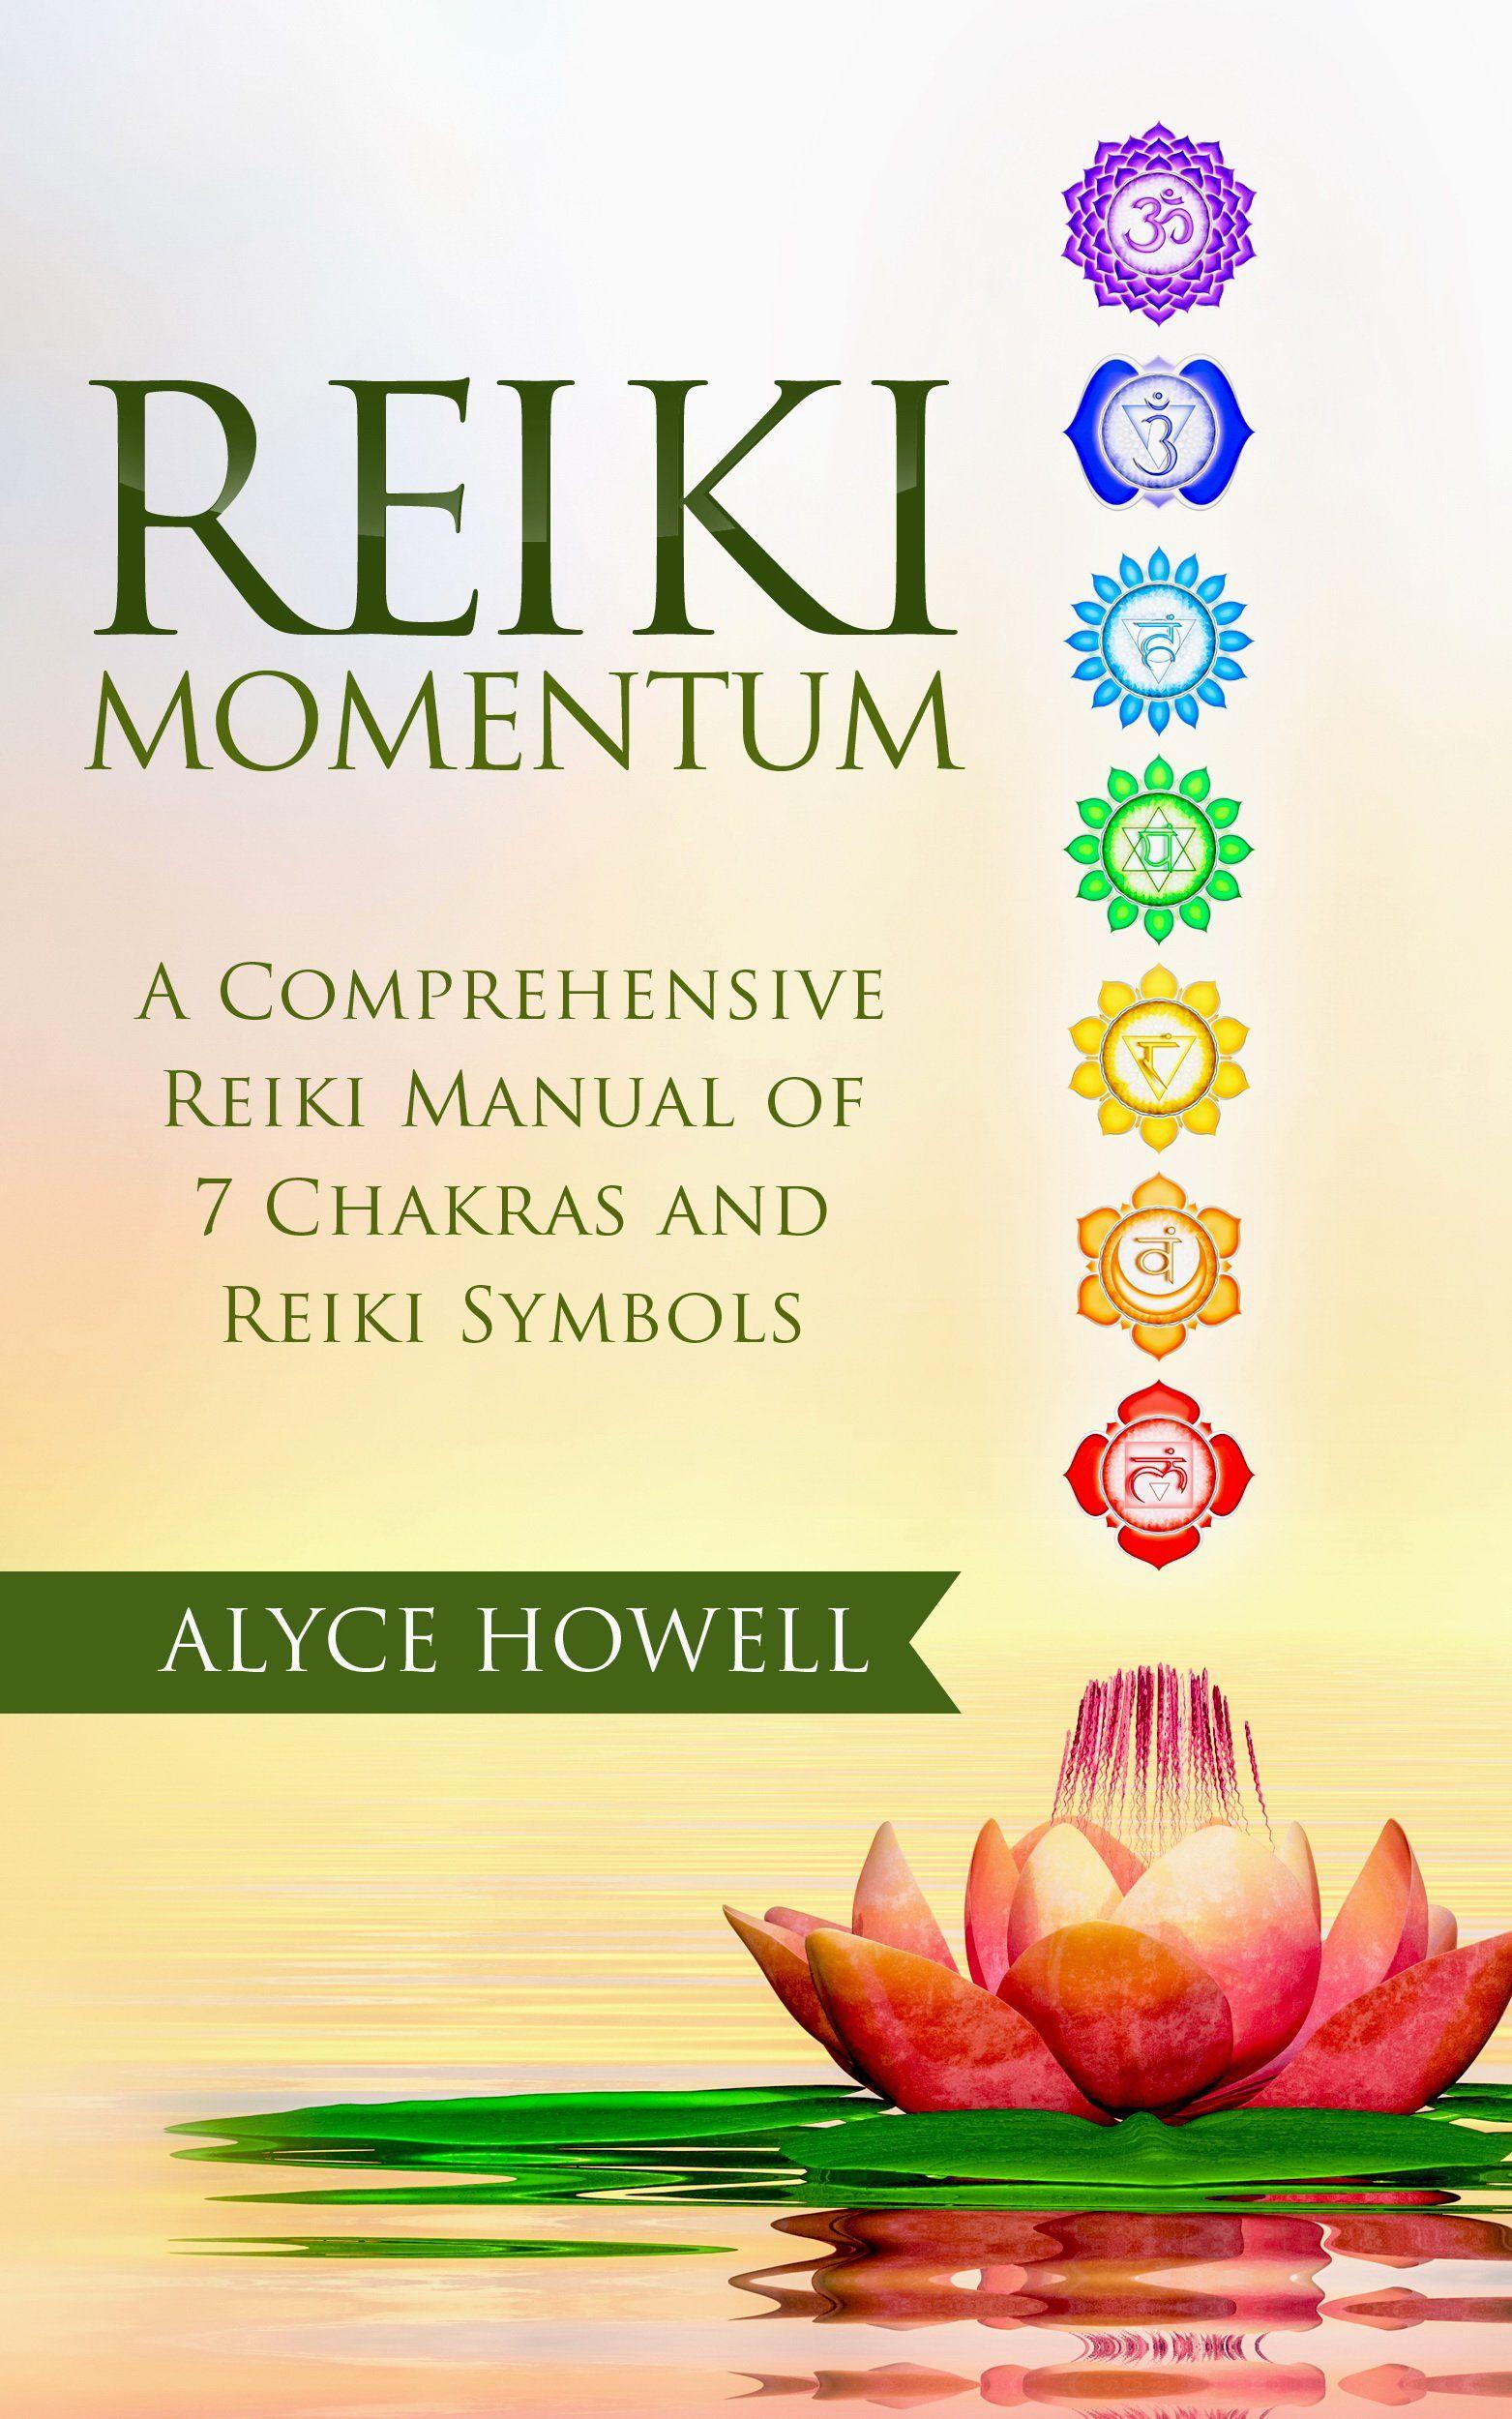 Cho ku rei reiki symbol chakras reiki symbols and chakra meditation reiki momentum a comprehensive reiki manual of chakras and reiki symbols reiki healing symbols buycottarizona Choice Image